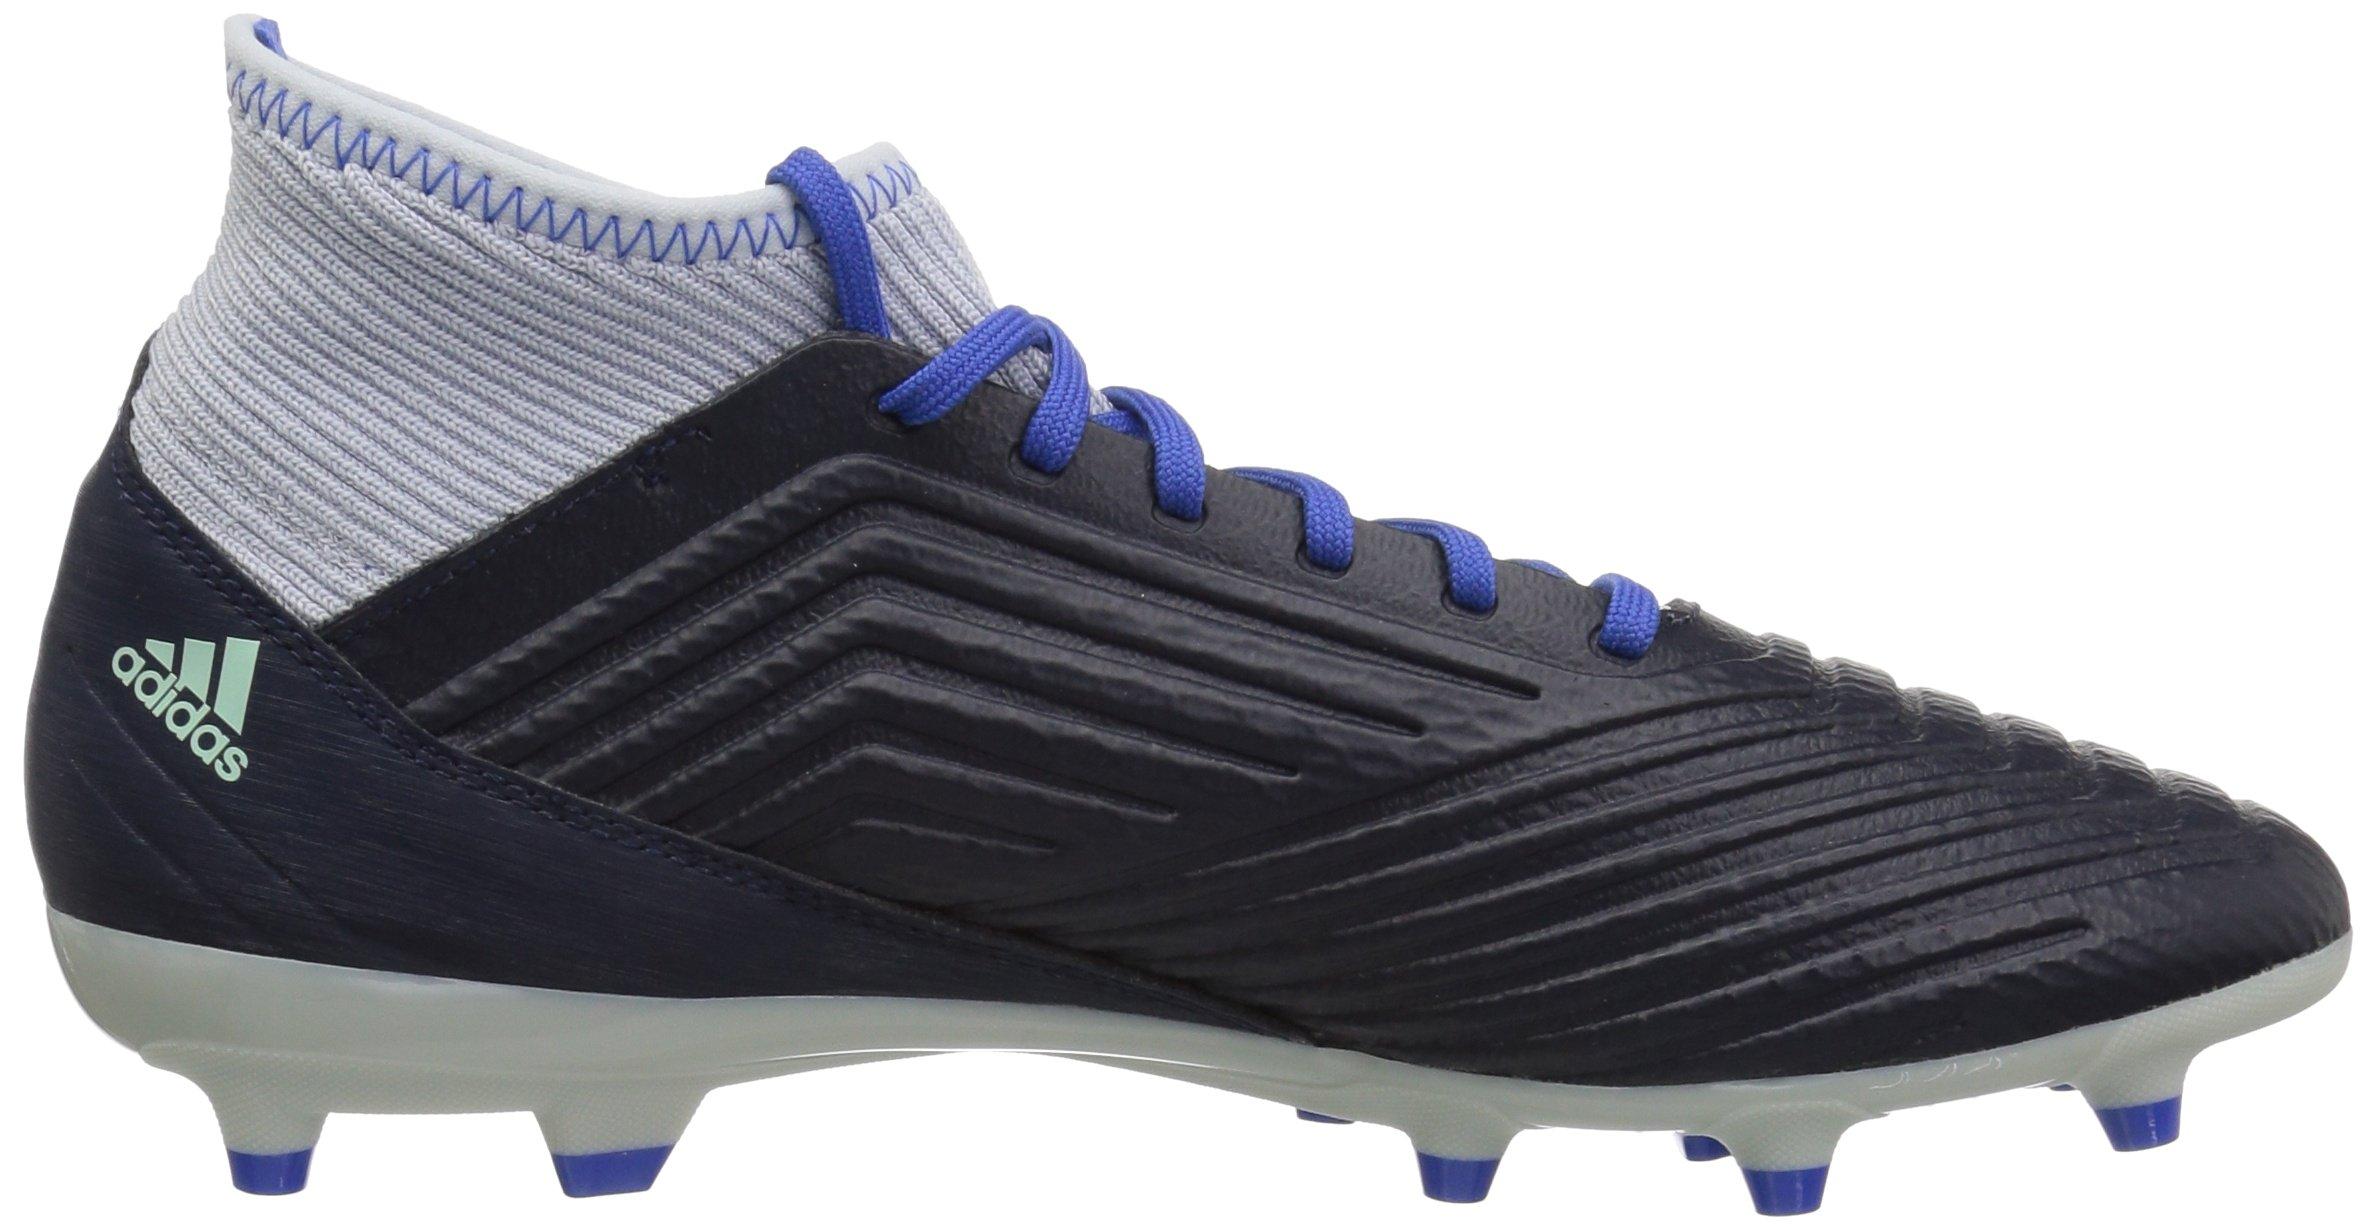 adidas Women's Predator 18.3 Firm Ground Soccer Shoe Legend Ink/Silver Metallic/aero Blue 5.5 M US by adidas (Image #6)